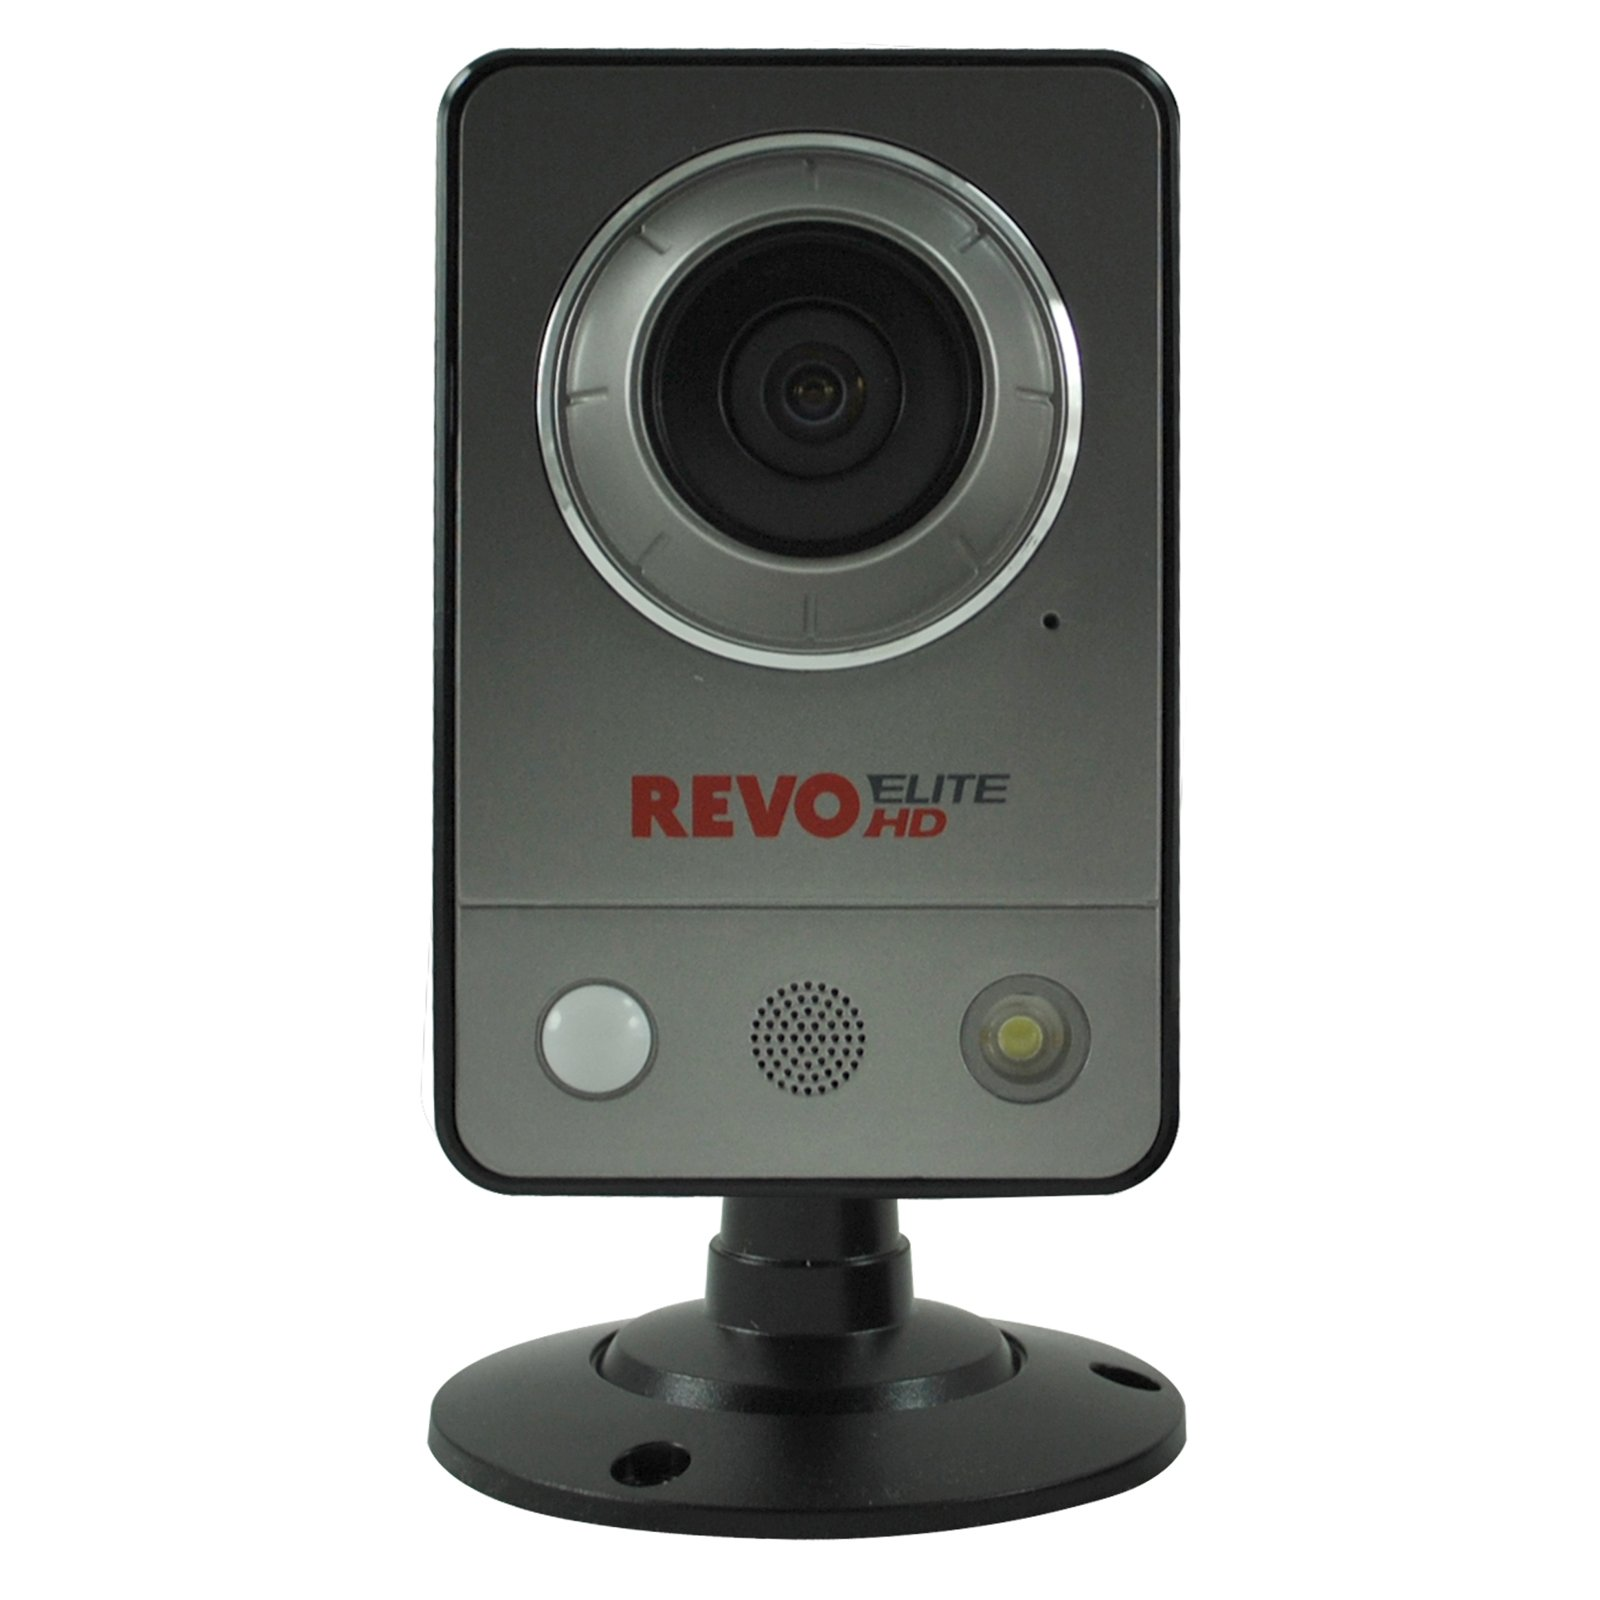 REVO America REHCUW-1 Elite HD Wireless/Wired Indoor IP Cube Camera (Grey)